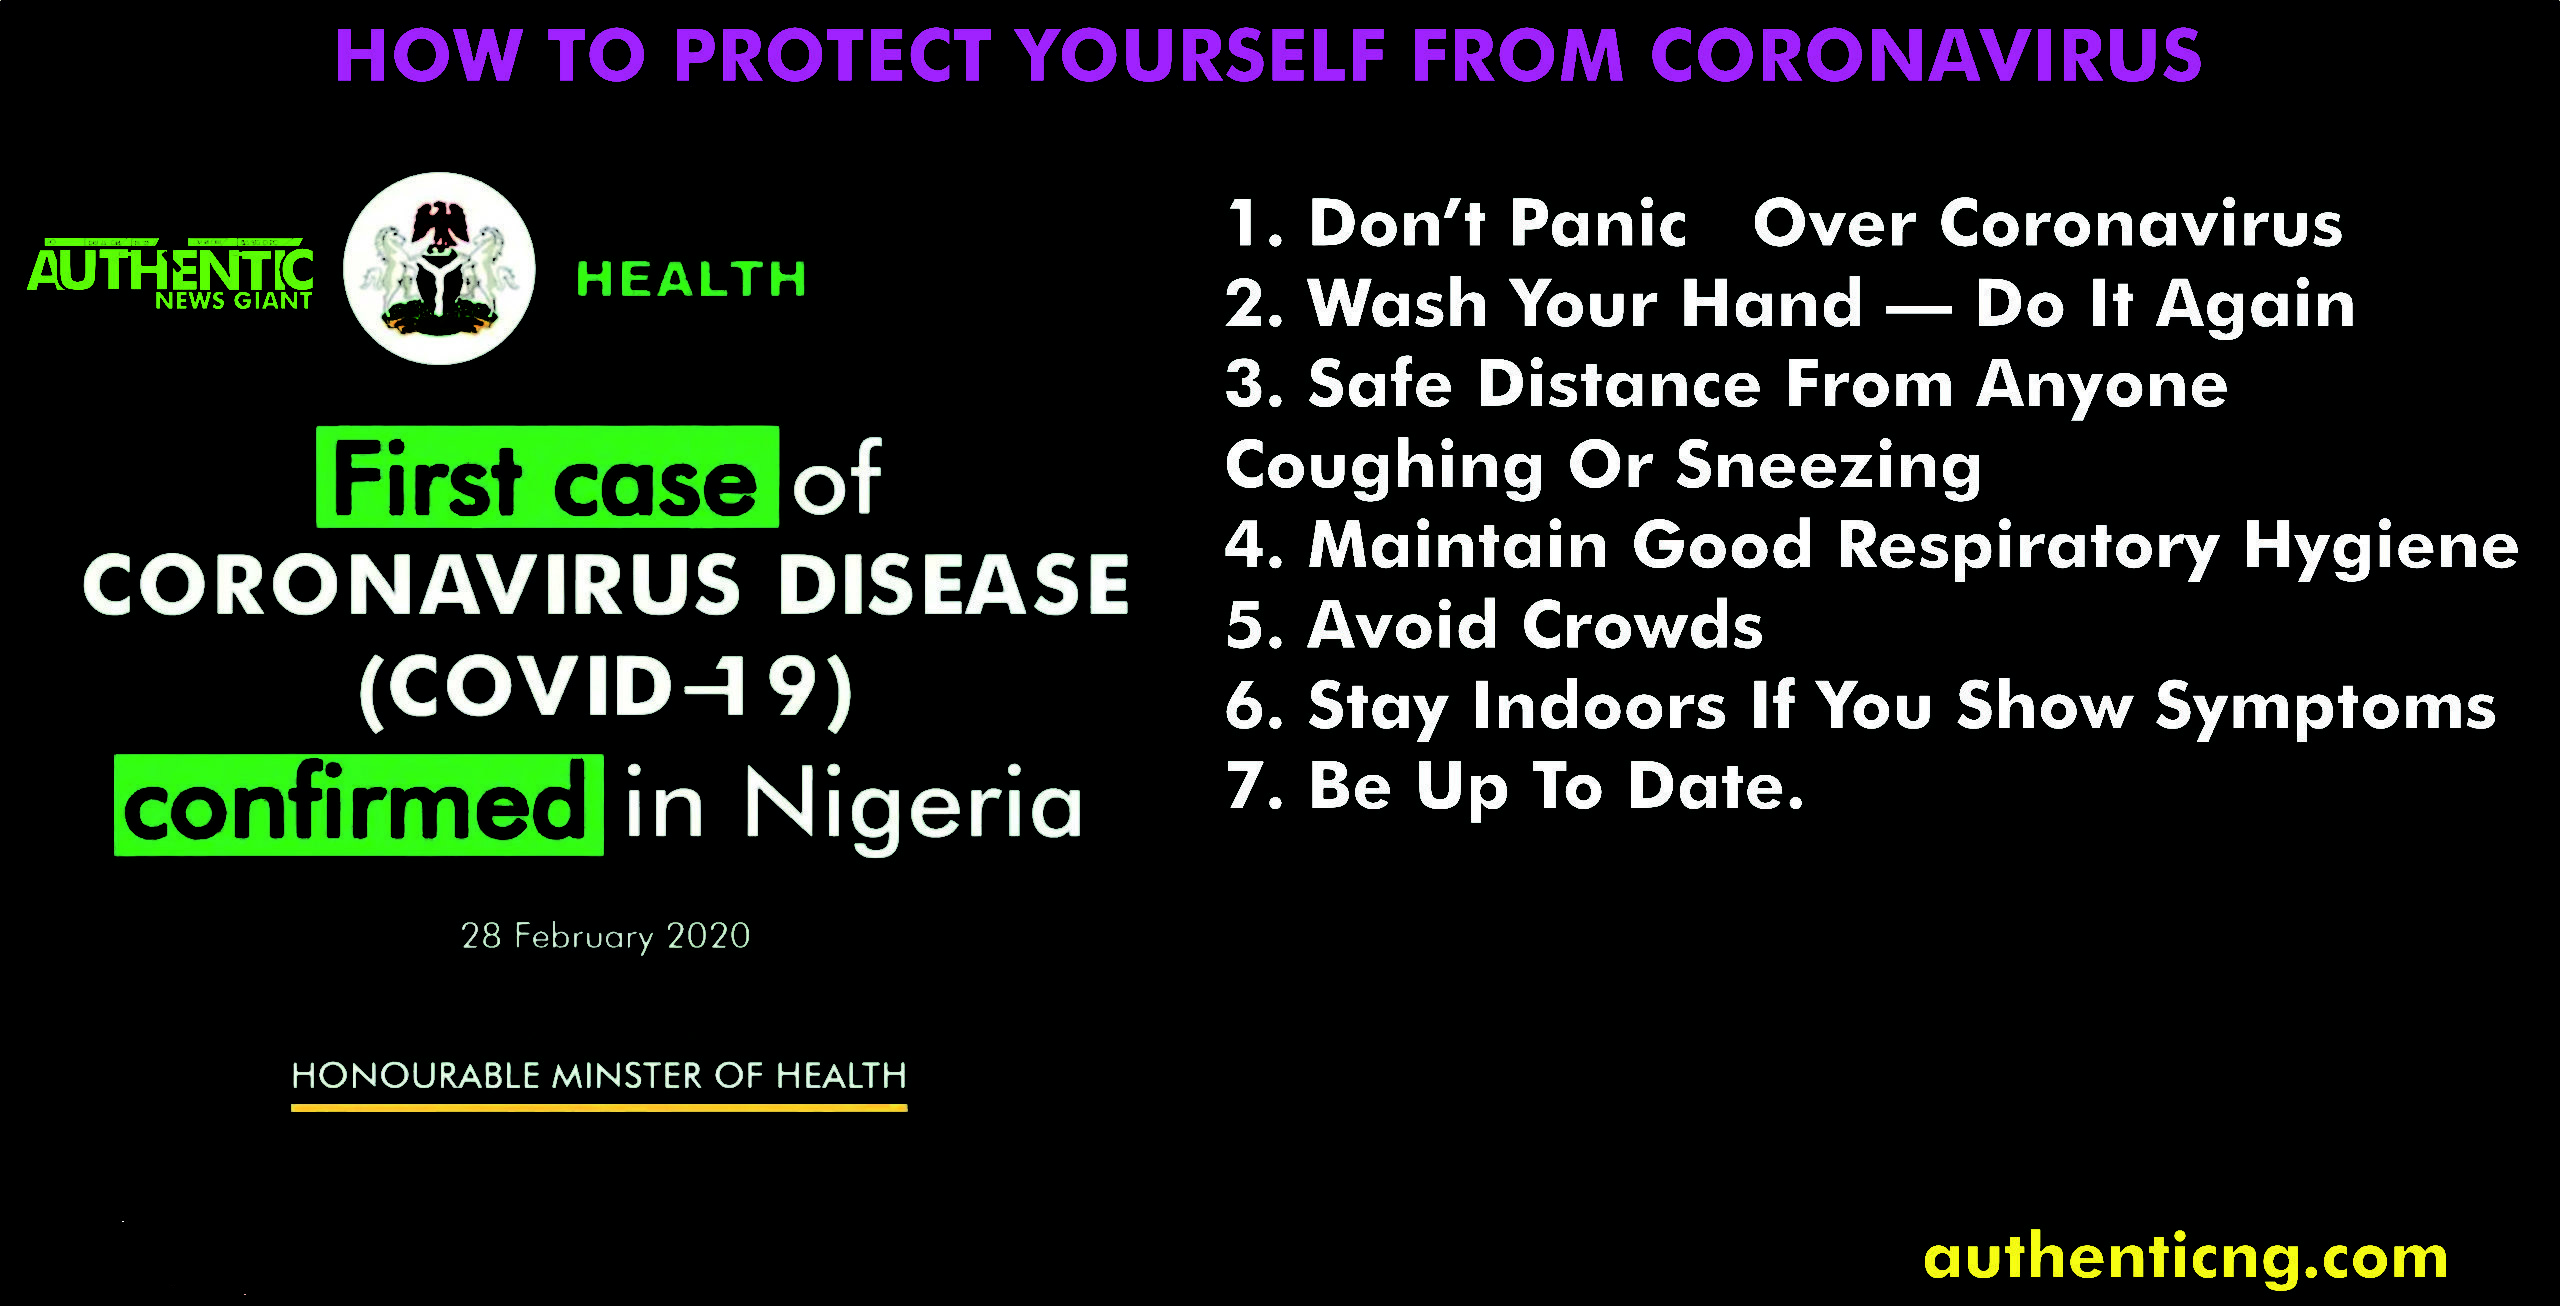 Coronavirus In Nigeria: How to Protect your self 1